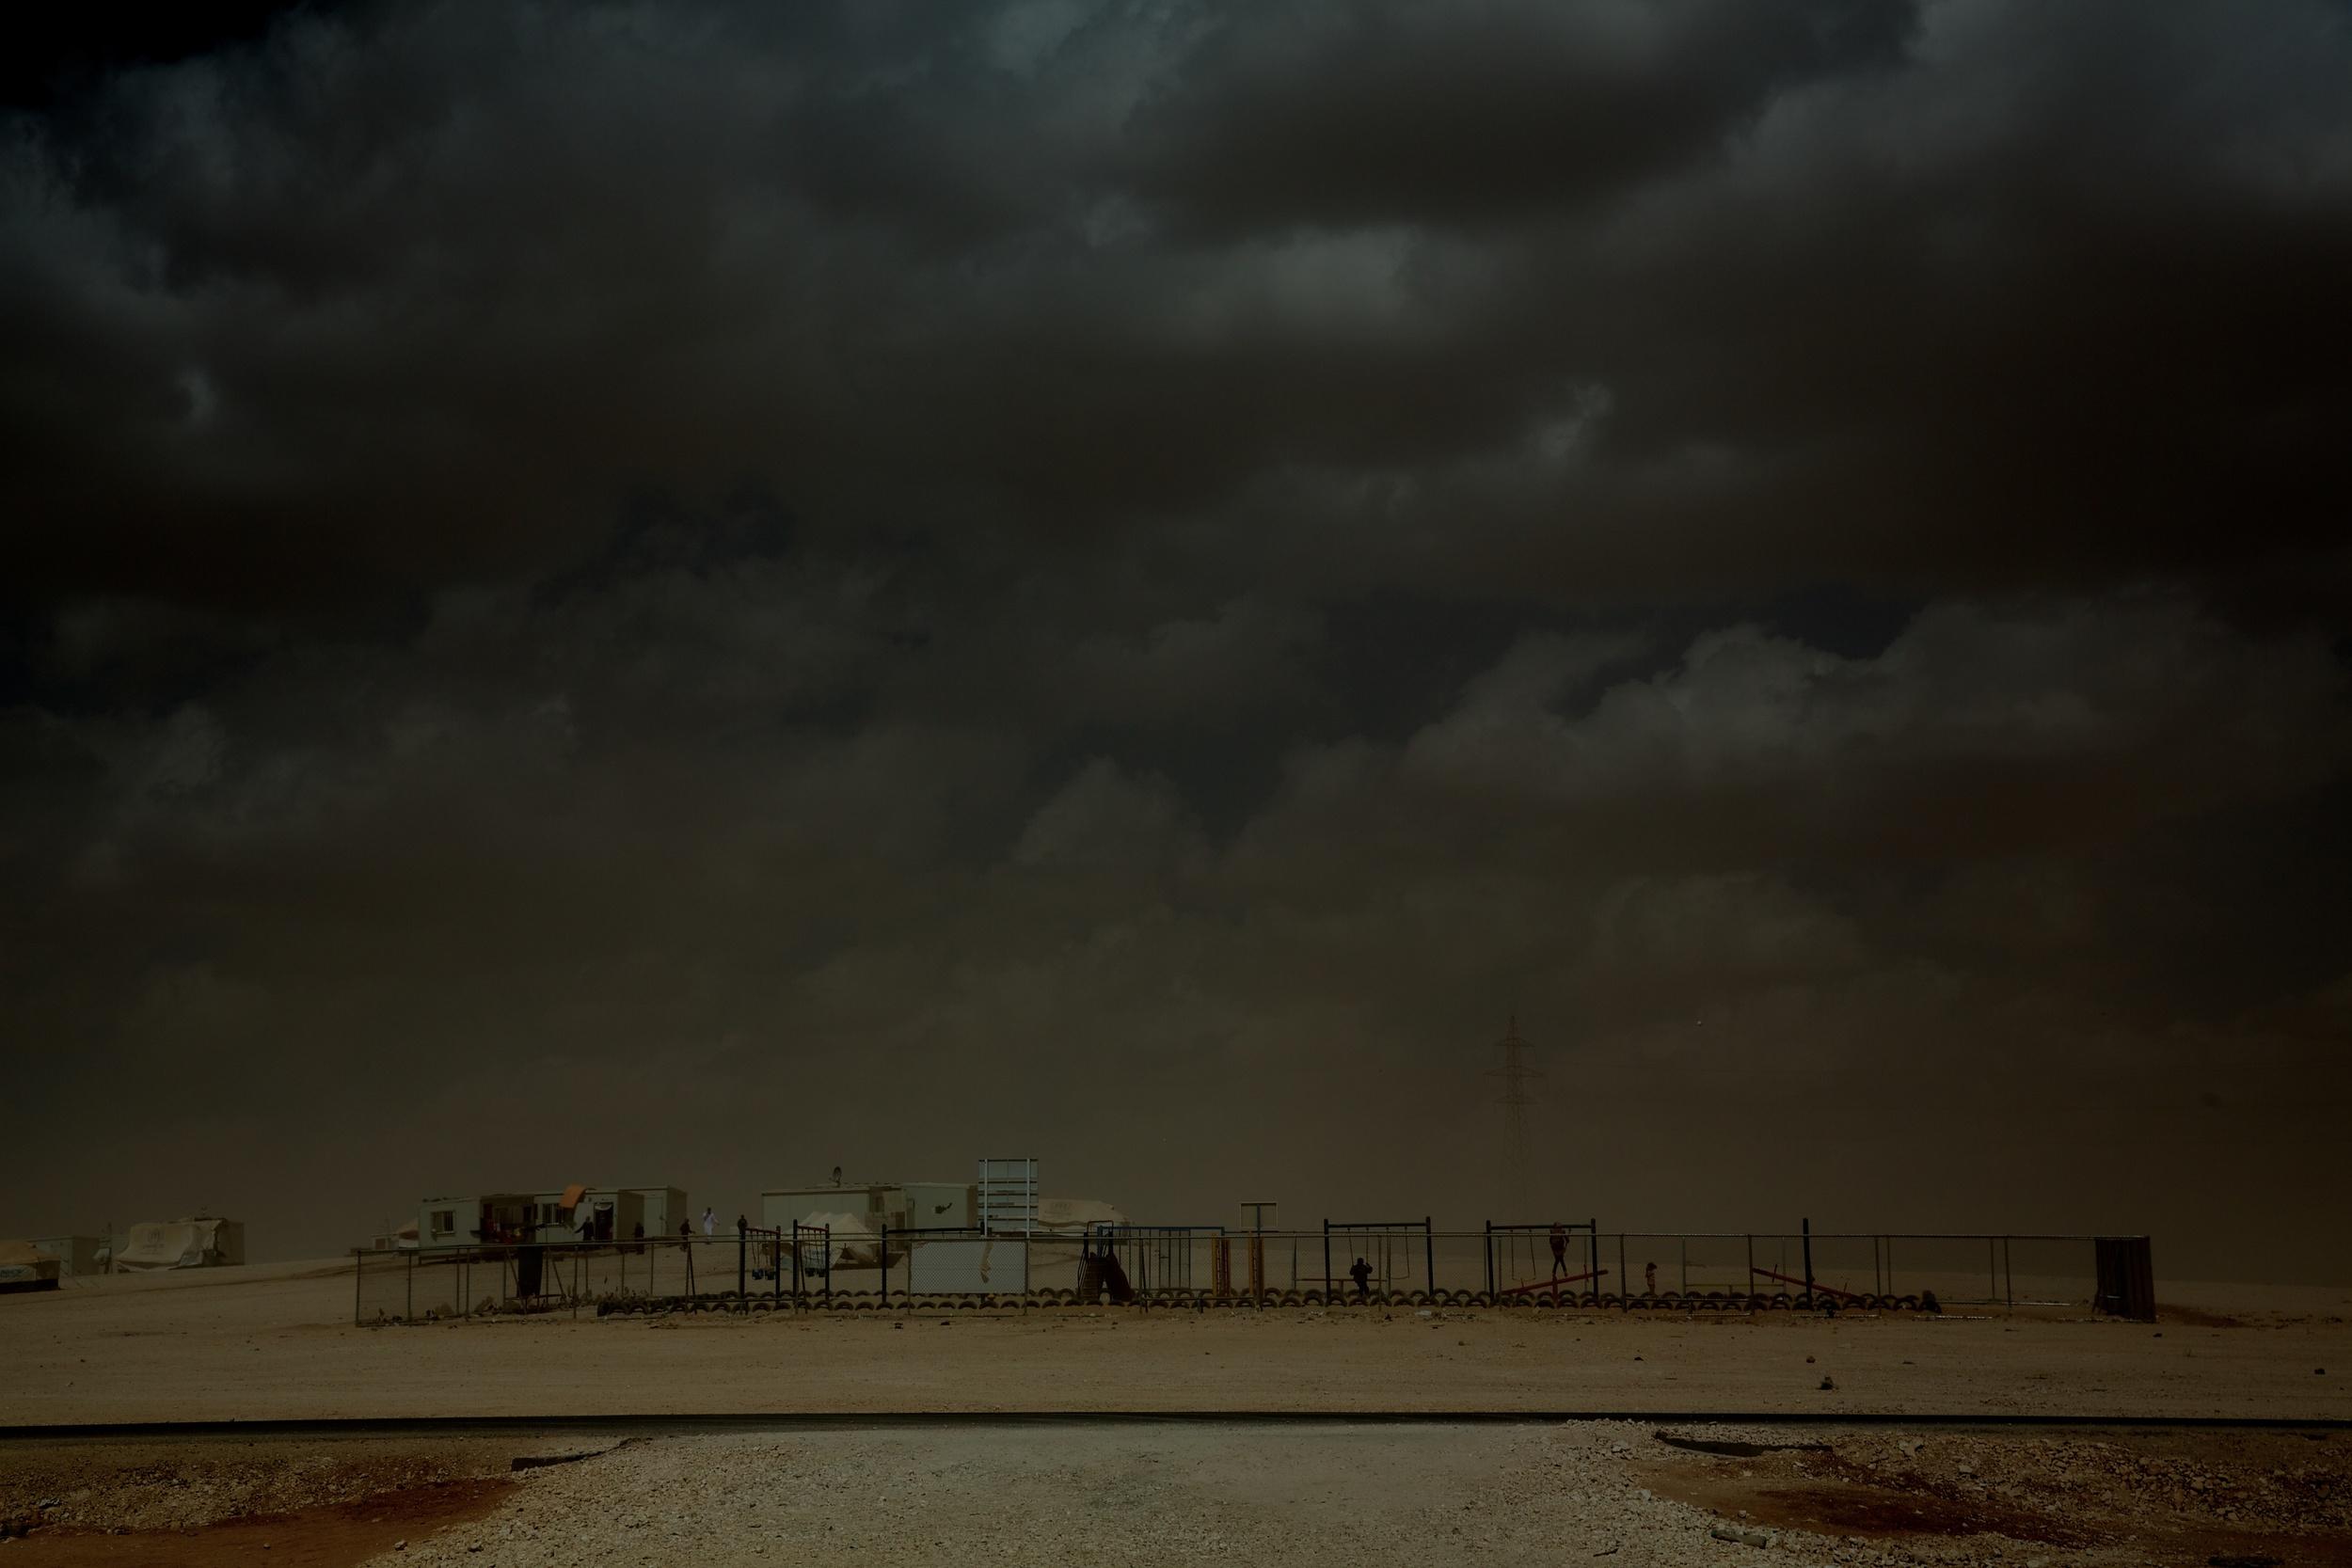 A playground at Zaatari refugee camp in Jordan.